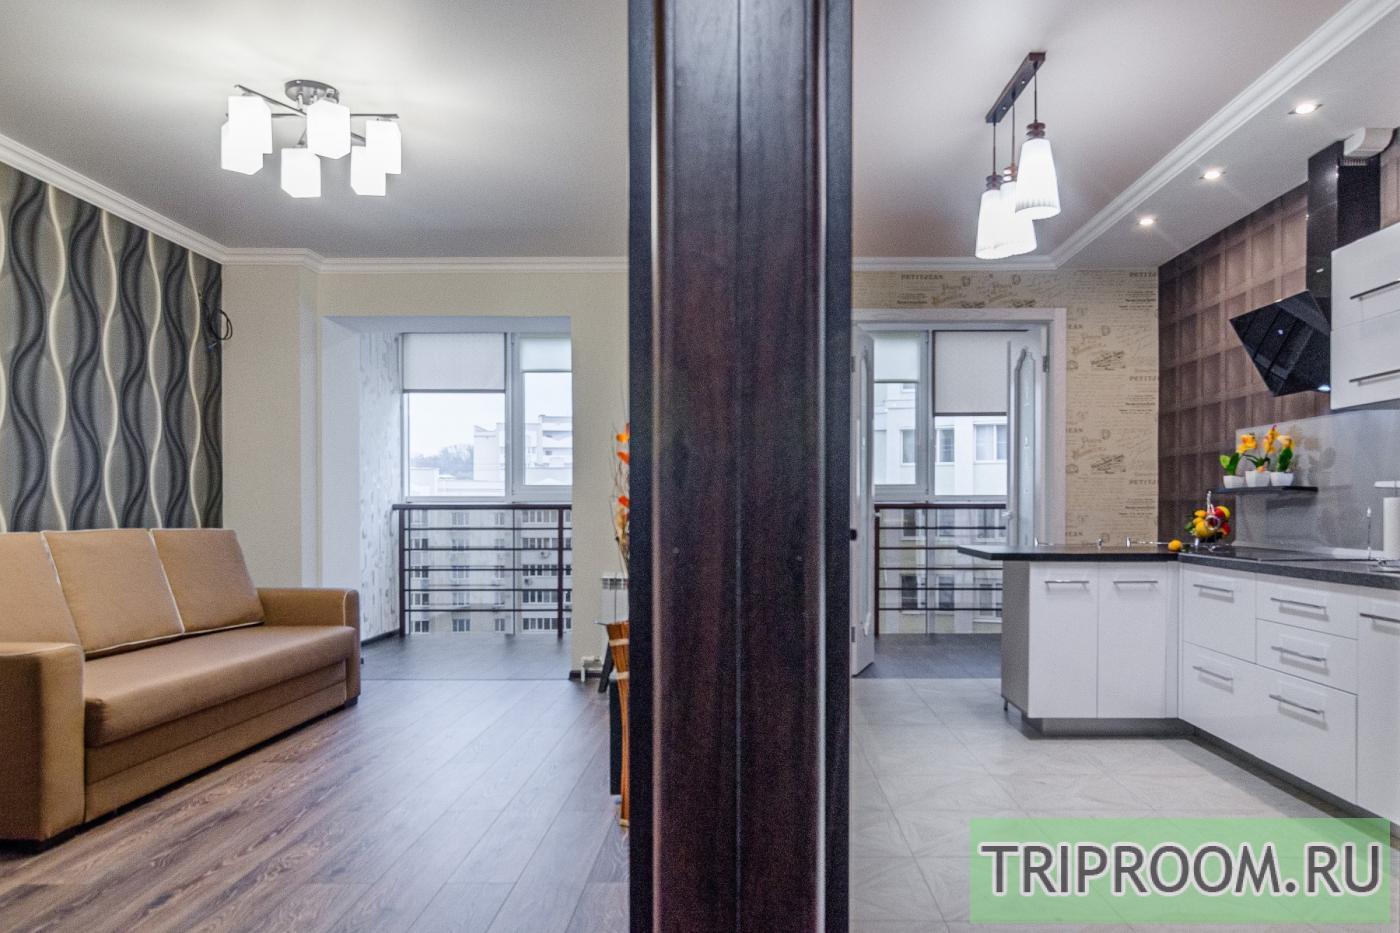 1-комнатная квартира посуточно (вариант № 28442), ул. Суворова улица, фото № 7